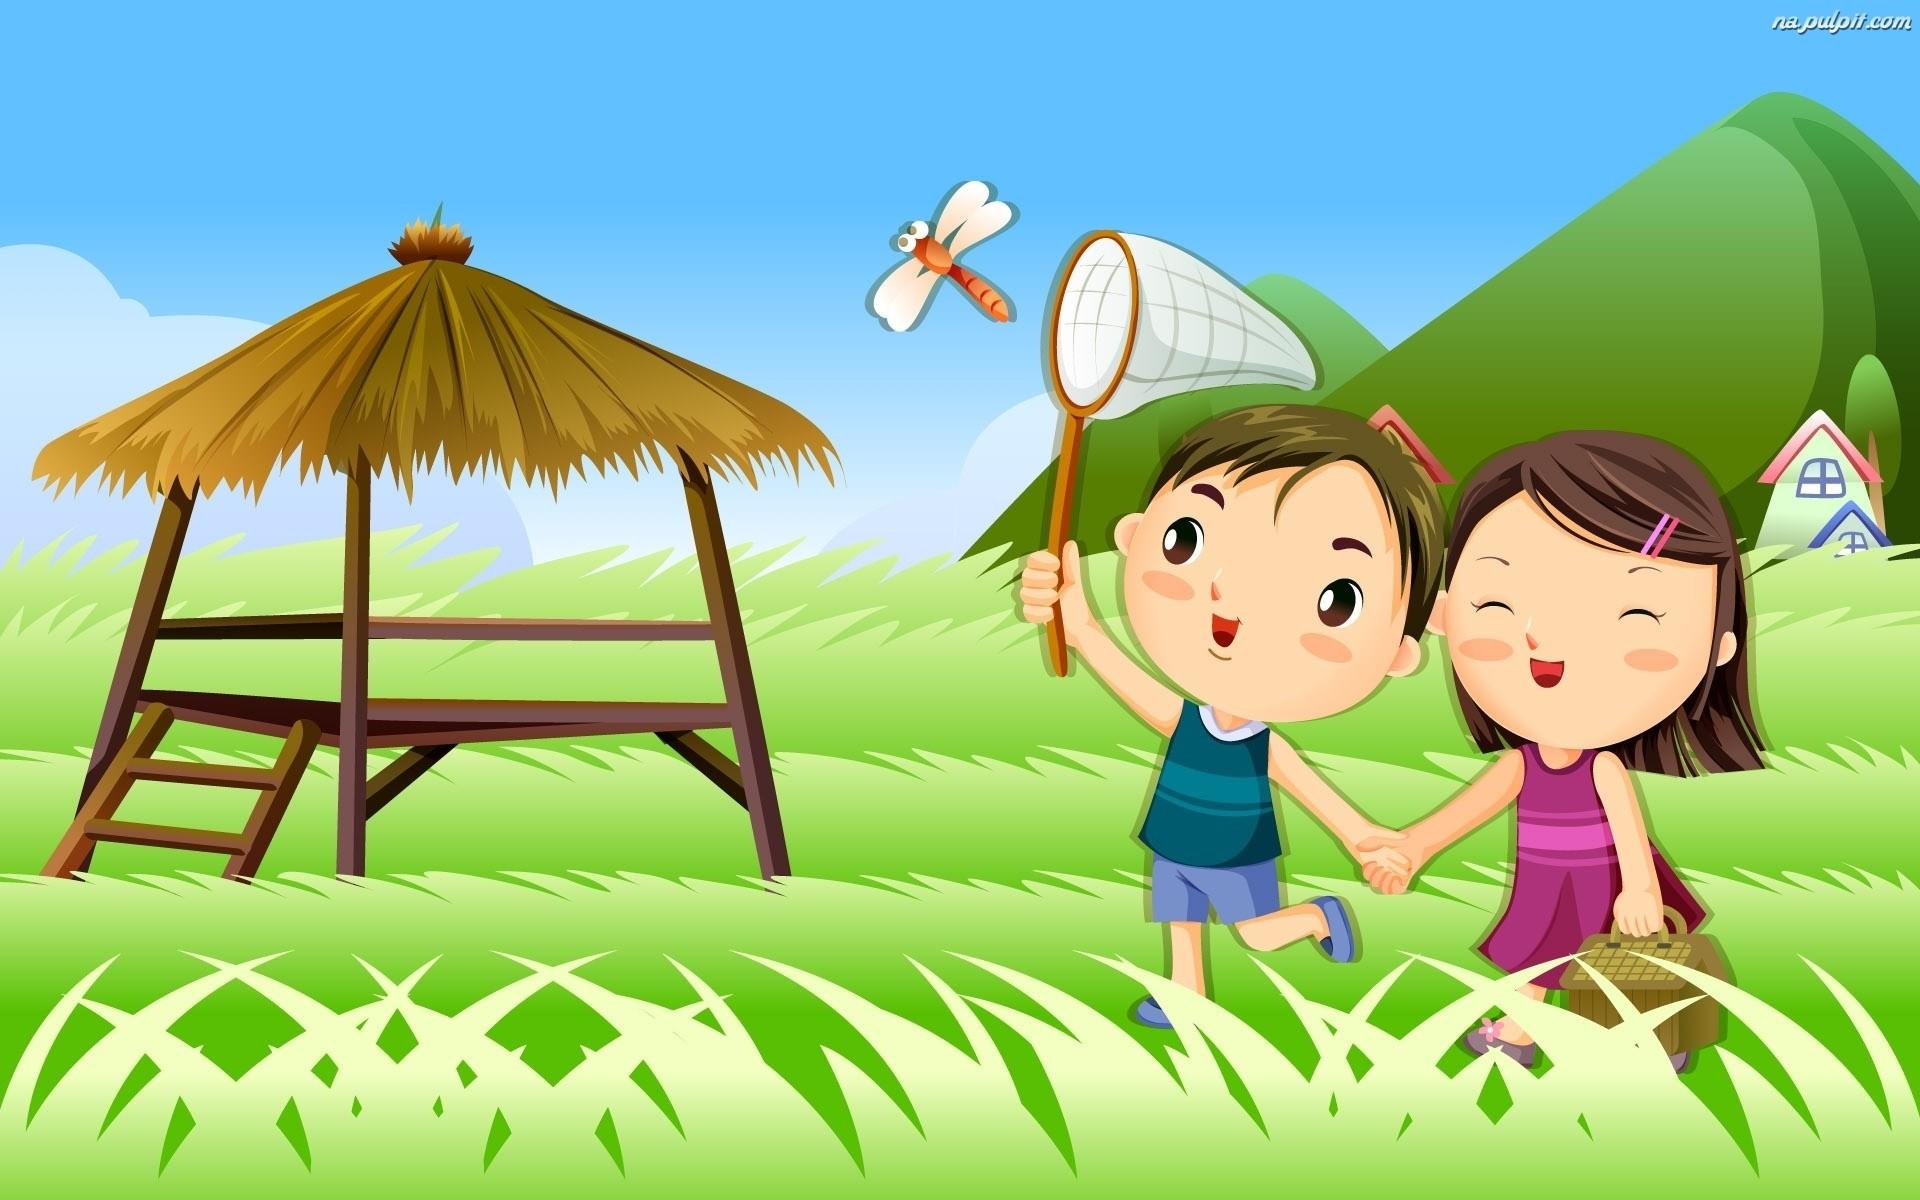 Kids wallpaper and screensavers 43 images - Cute screensavers for kids ...